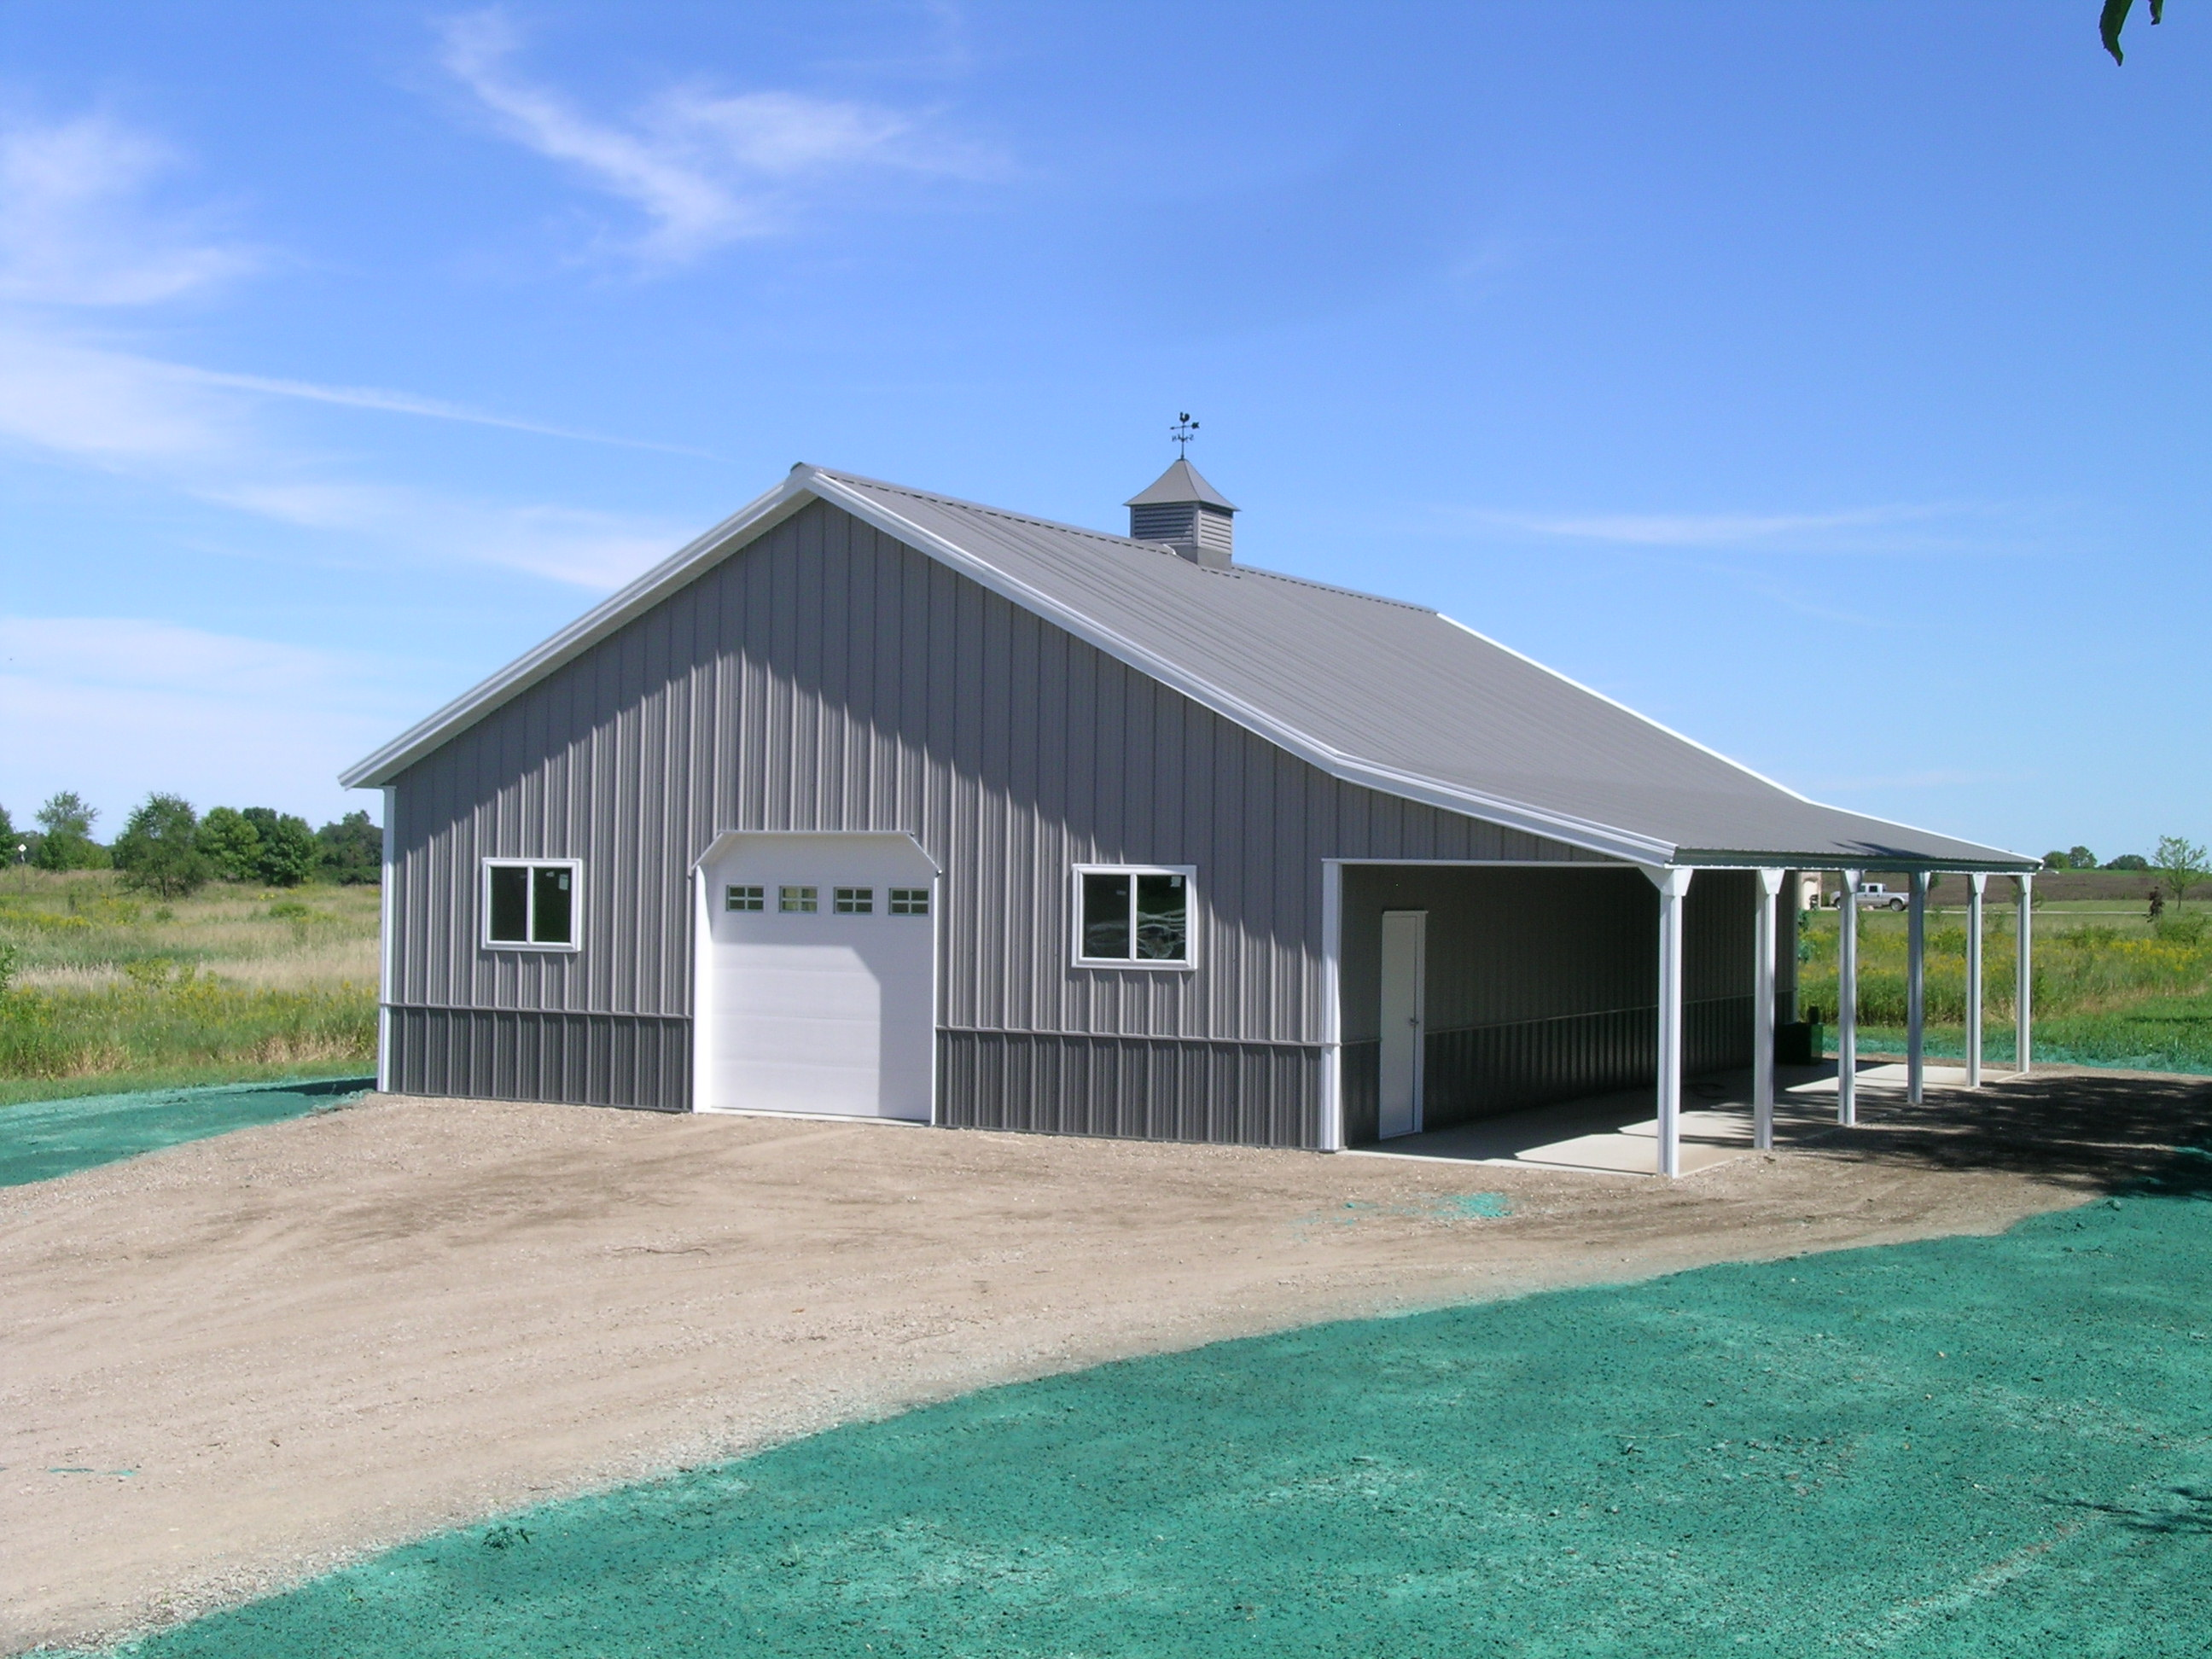 Corcoran Mn Garage Hobby Shop Building Lester